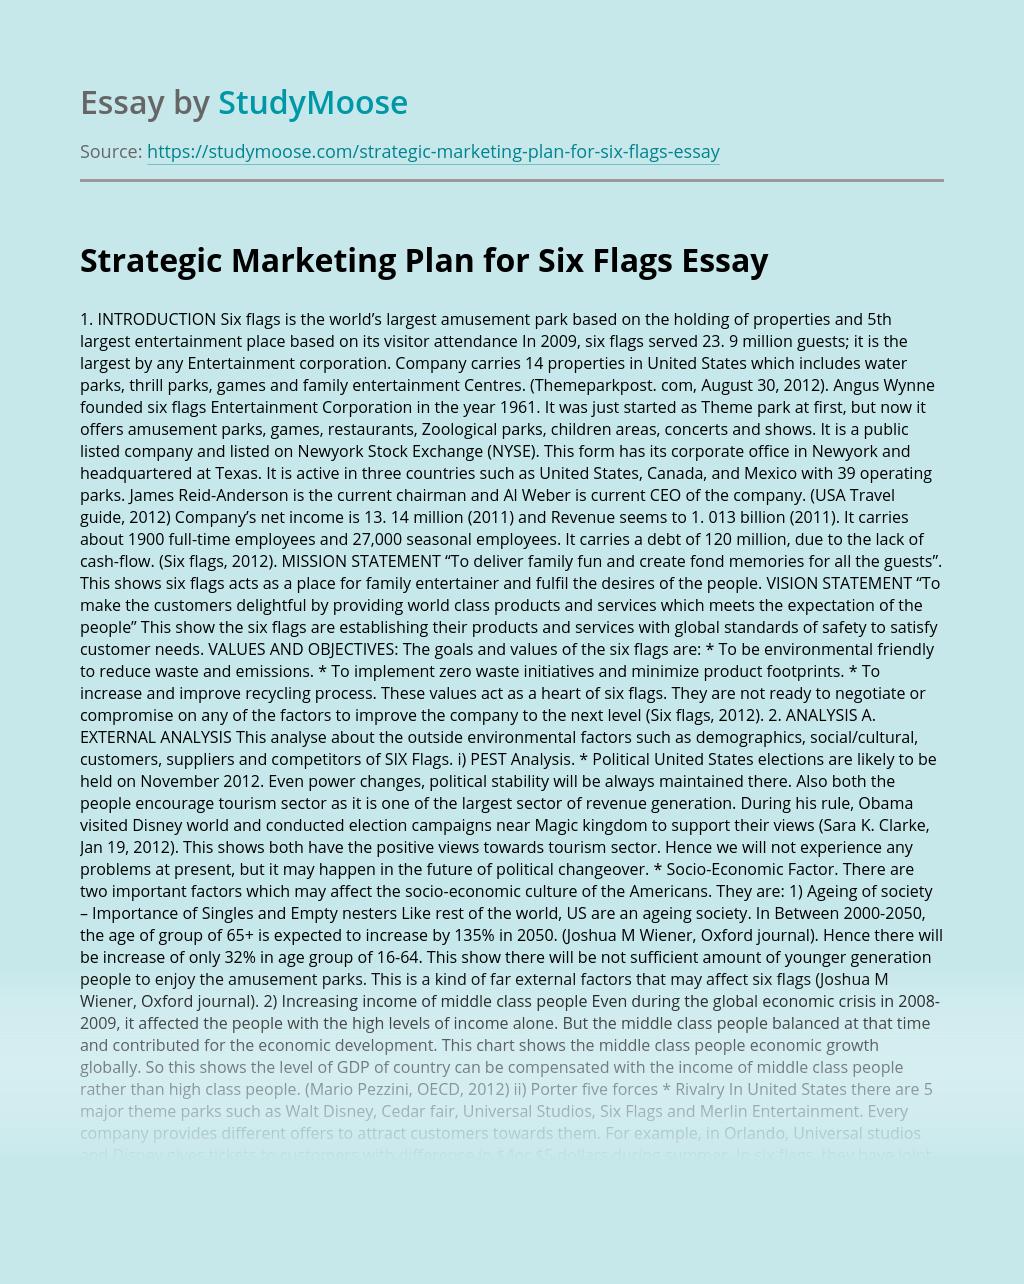 Strategic Marketing Plan for Six Flags